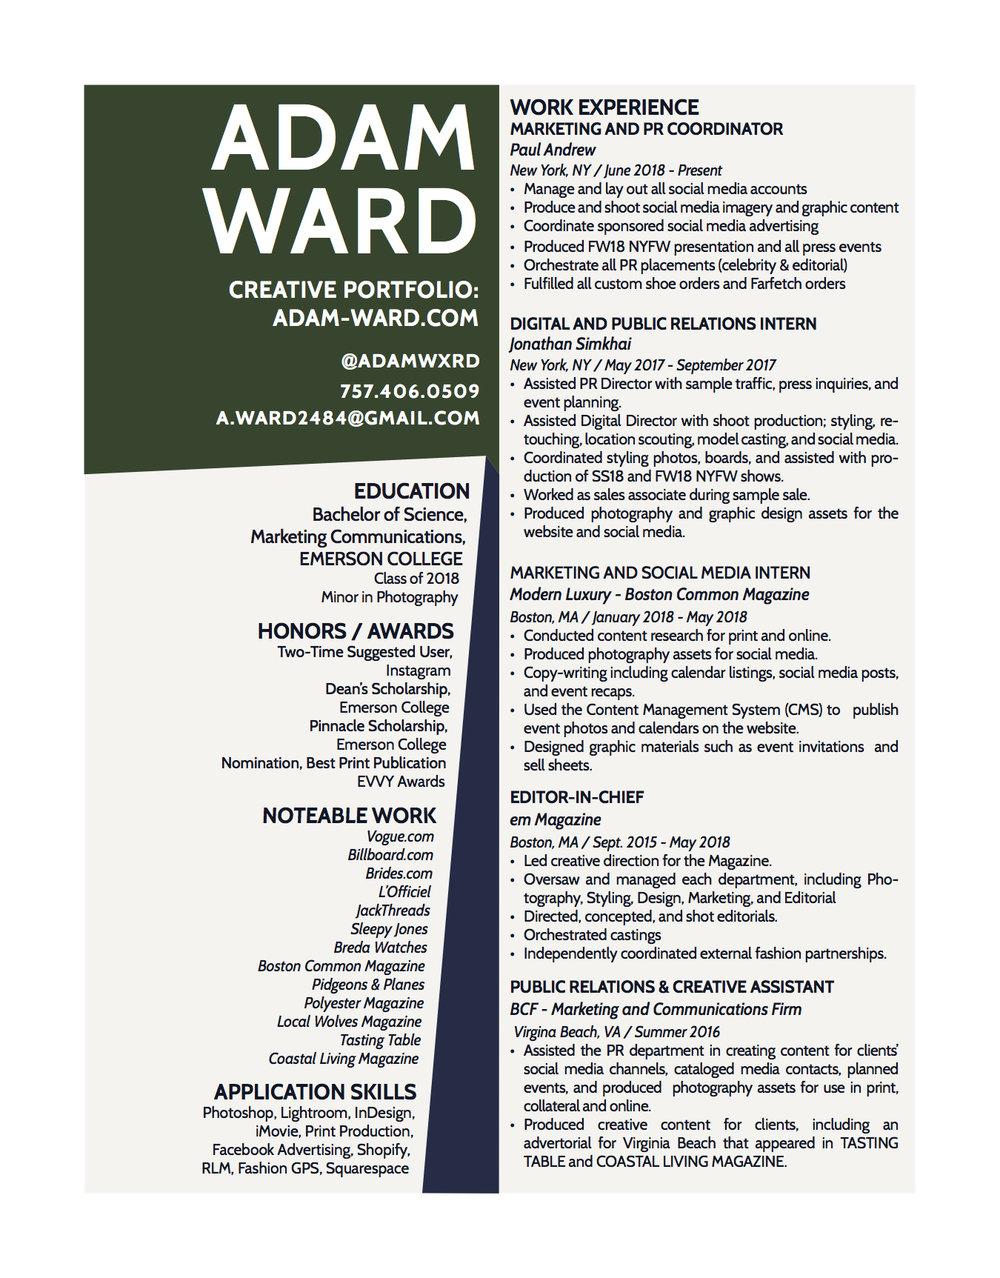 Adam Ward Resume MARCH 2019 (1) (1).jpg